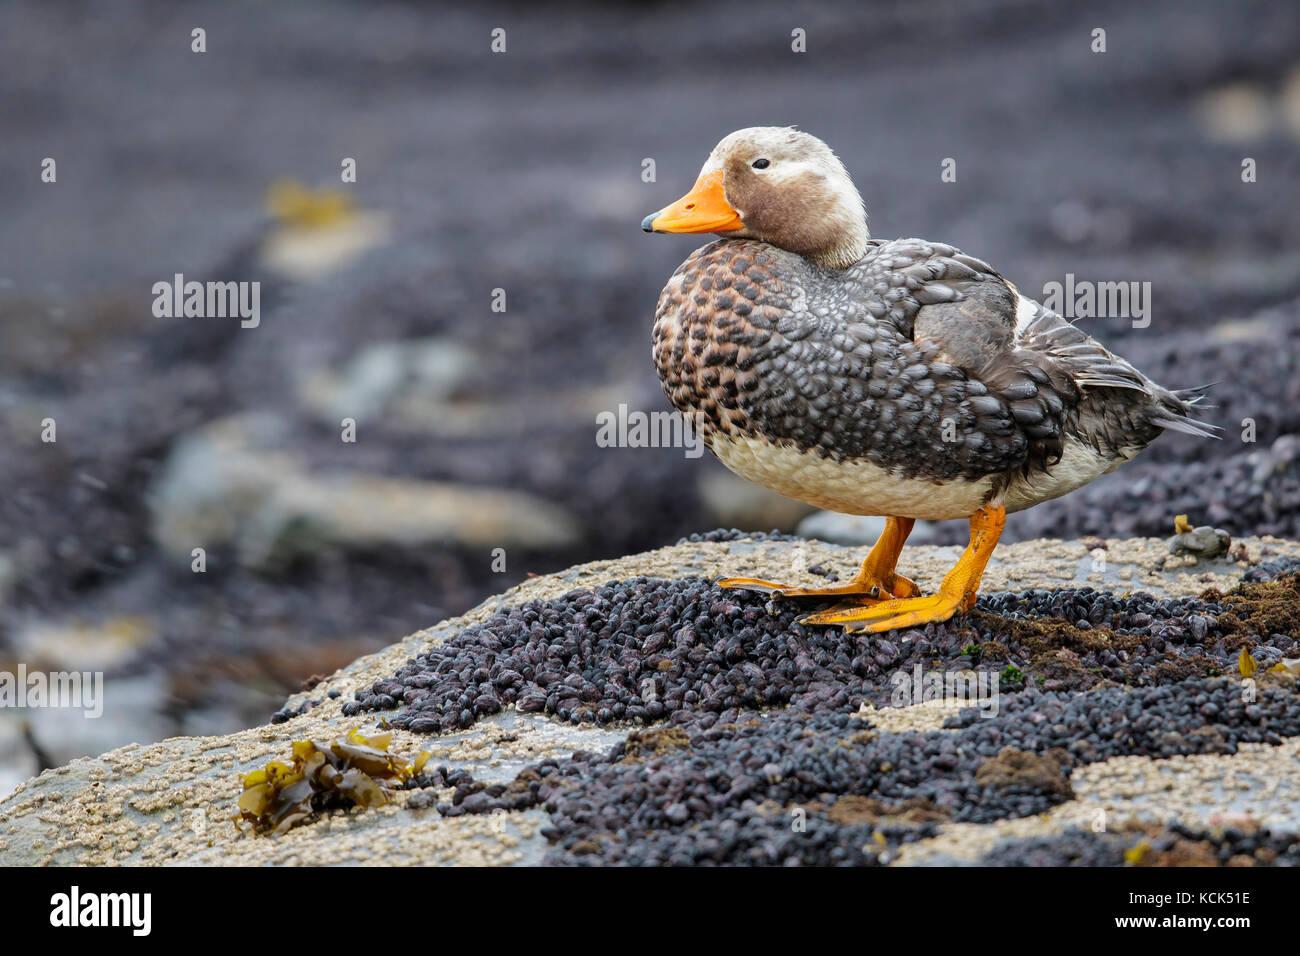 Falkland (Flightless) Steamer-Duck (Tachyeres brachypterus) perched on a rock in the Falkland Islands. - Stock Image